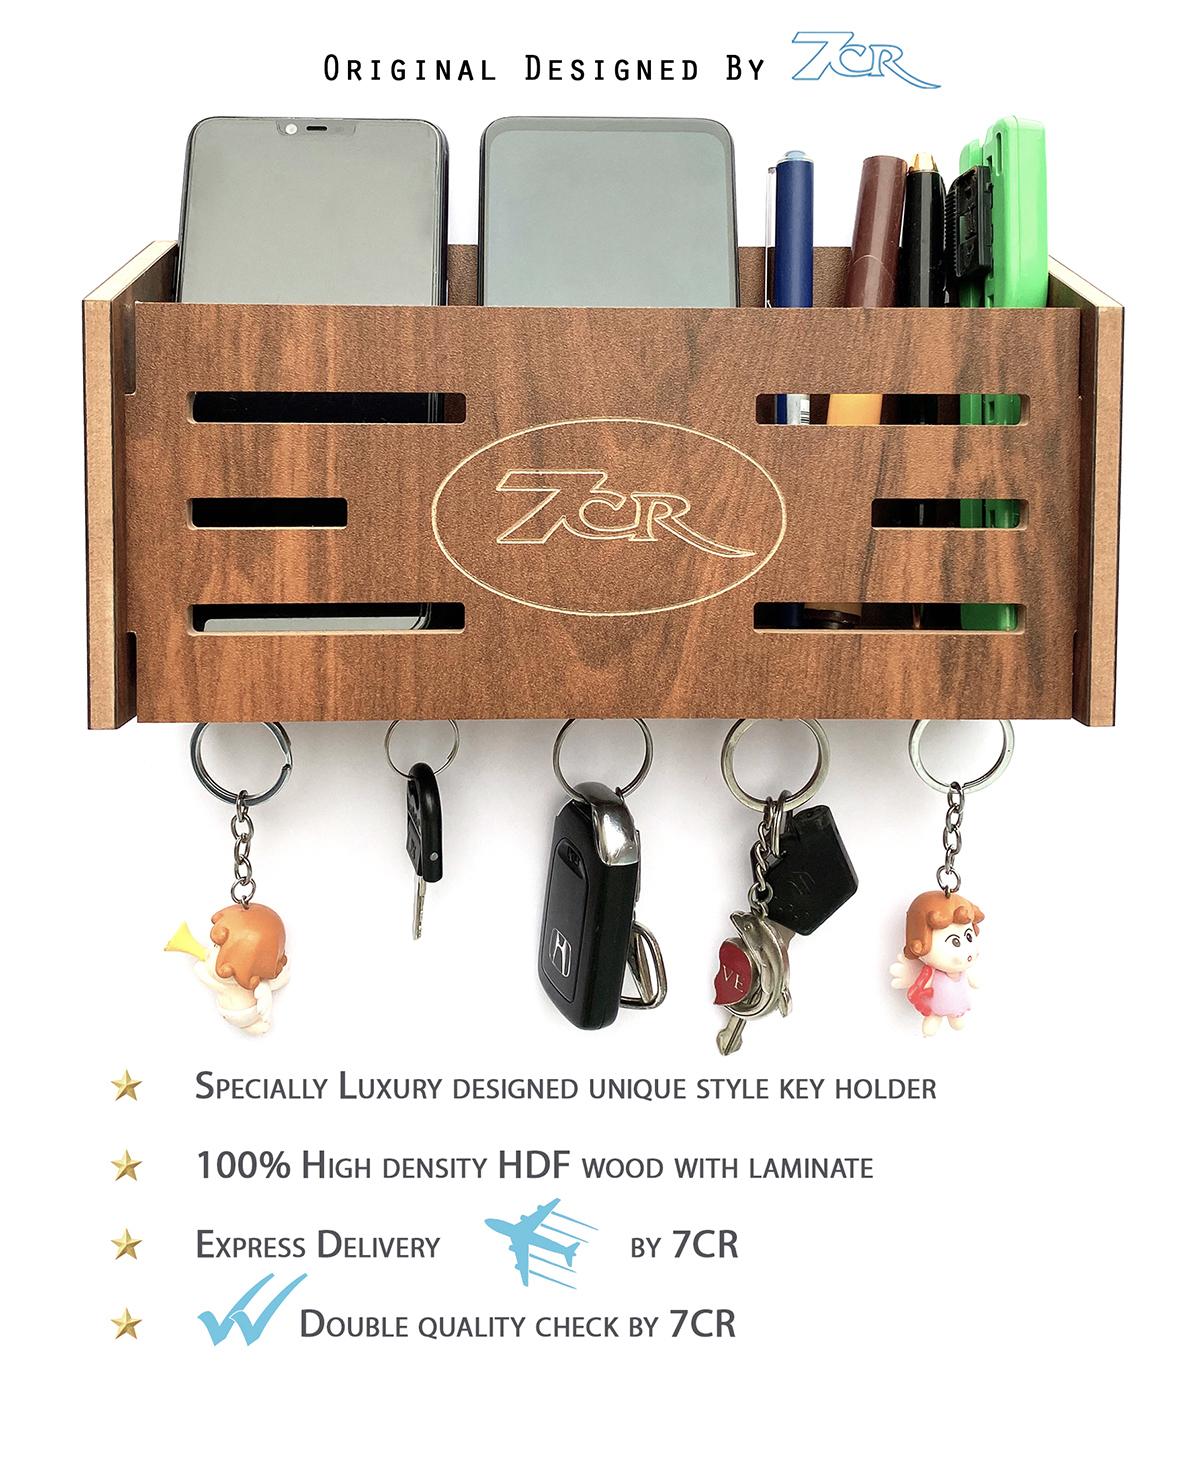 Key Holder and Shelf